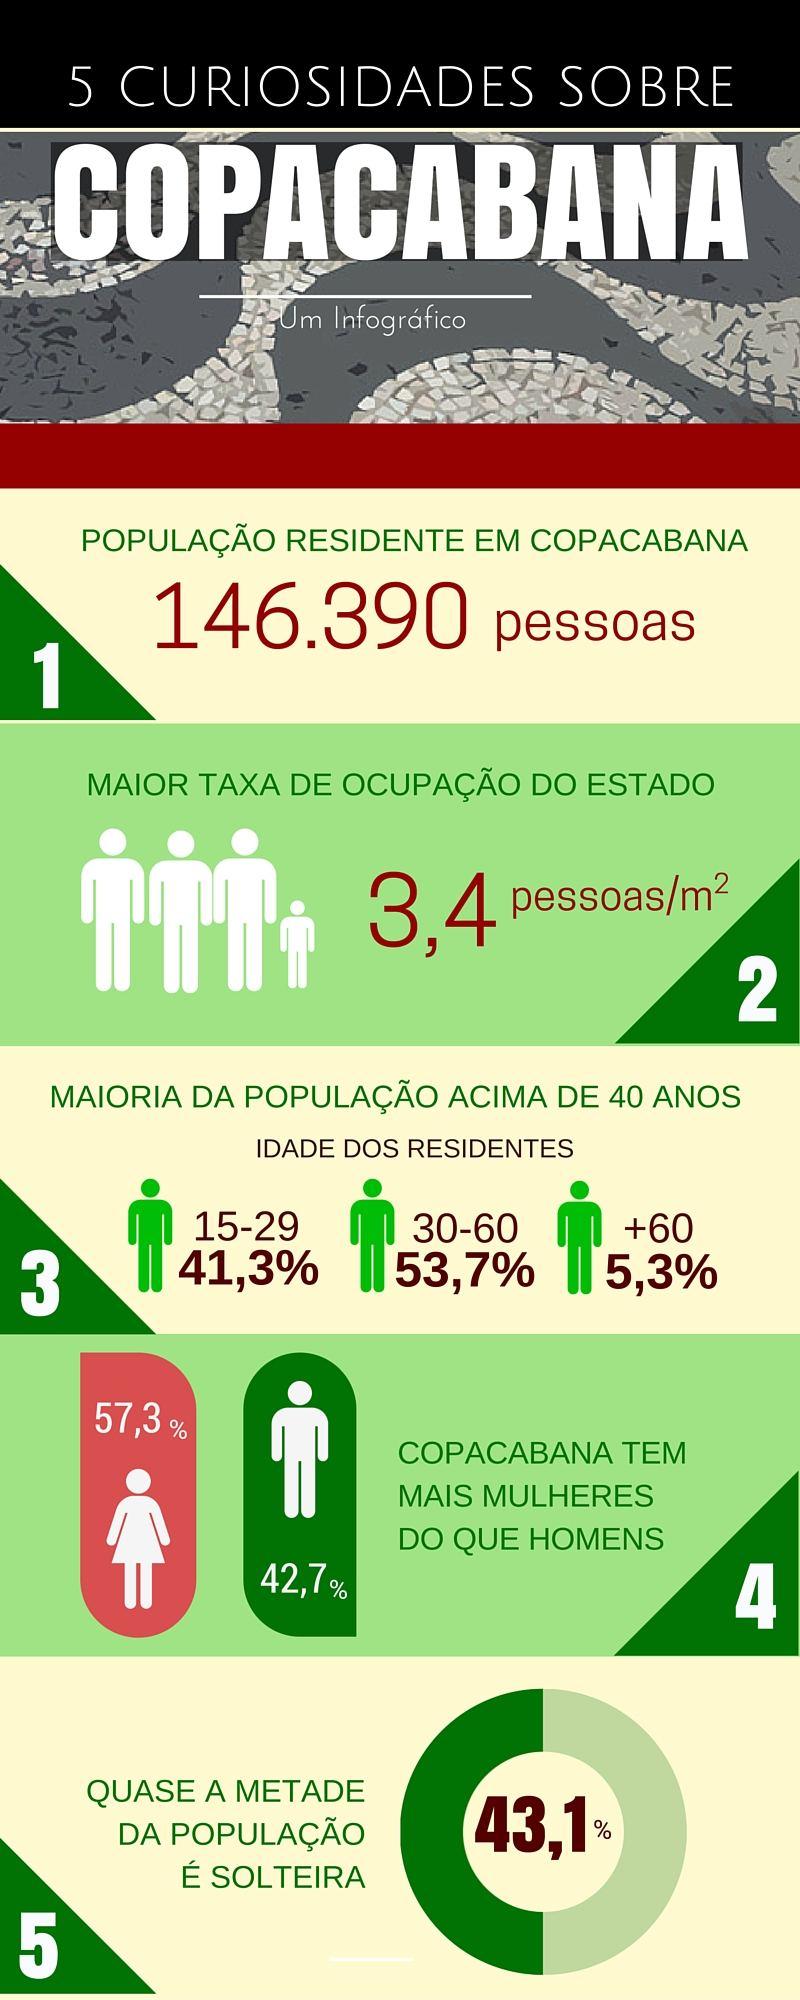 5 curiosidades sobre Copacabana